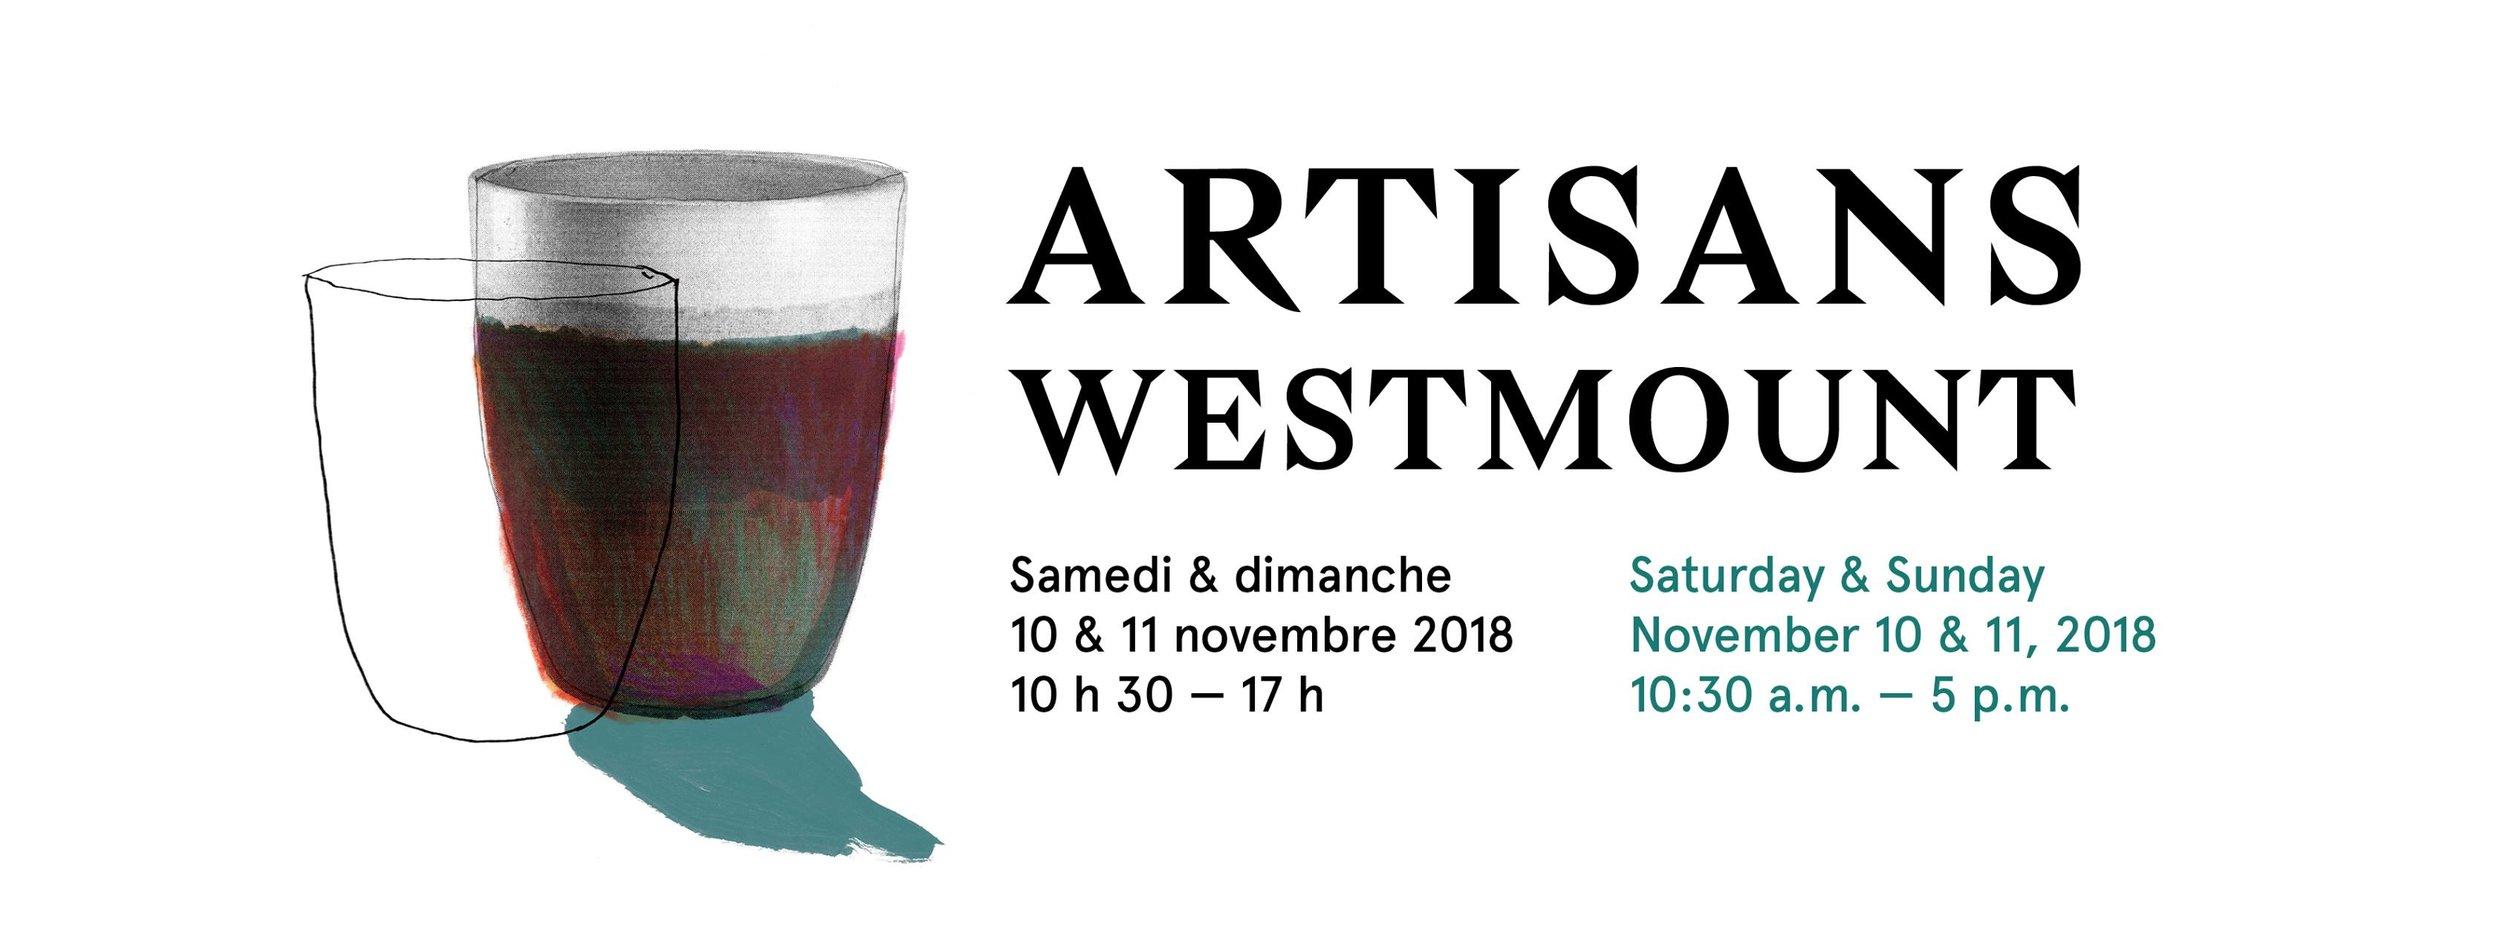 artisans-westmount-2018